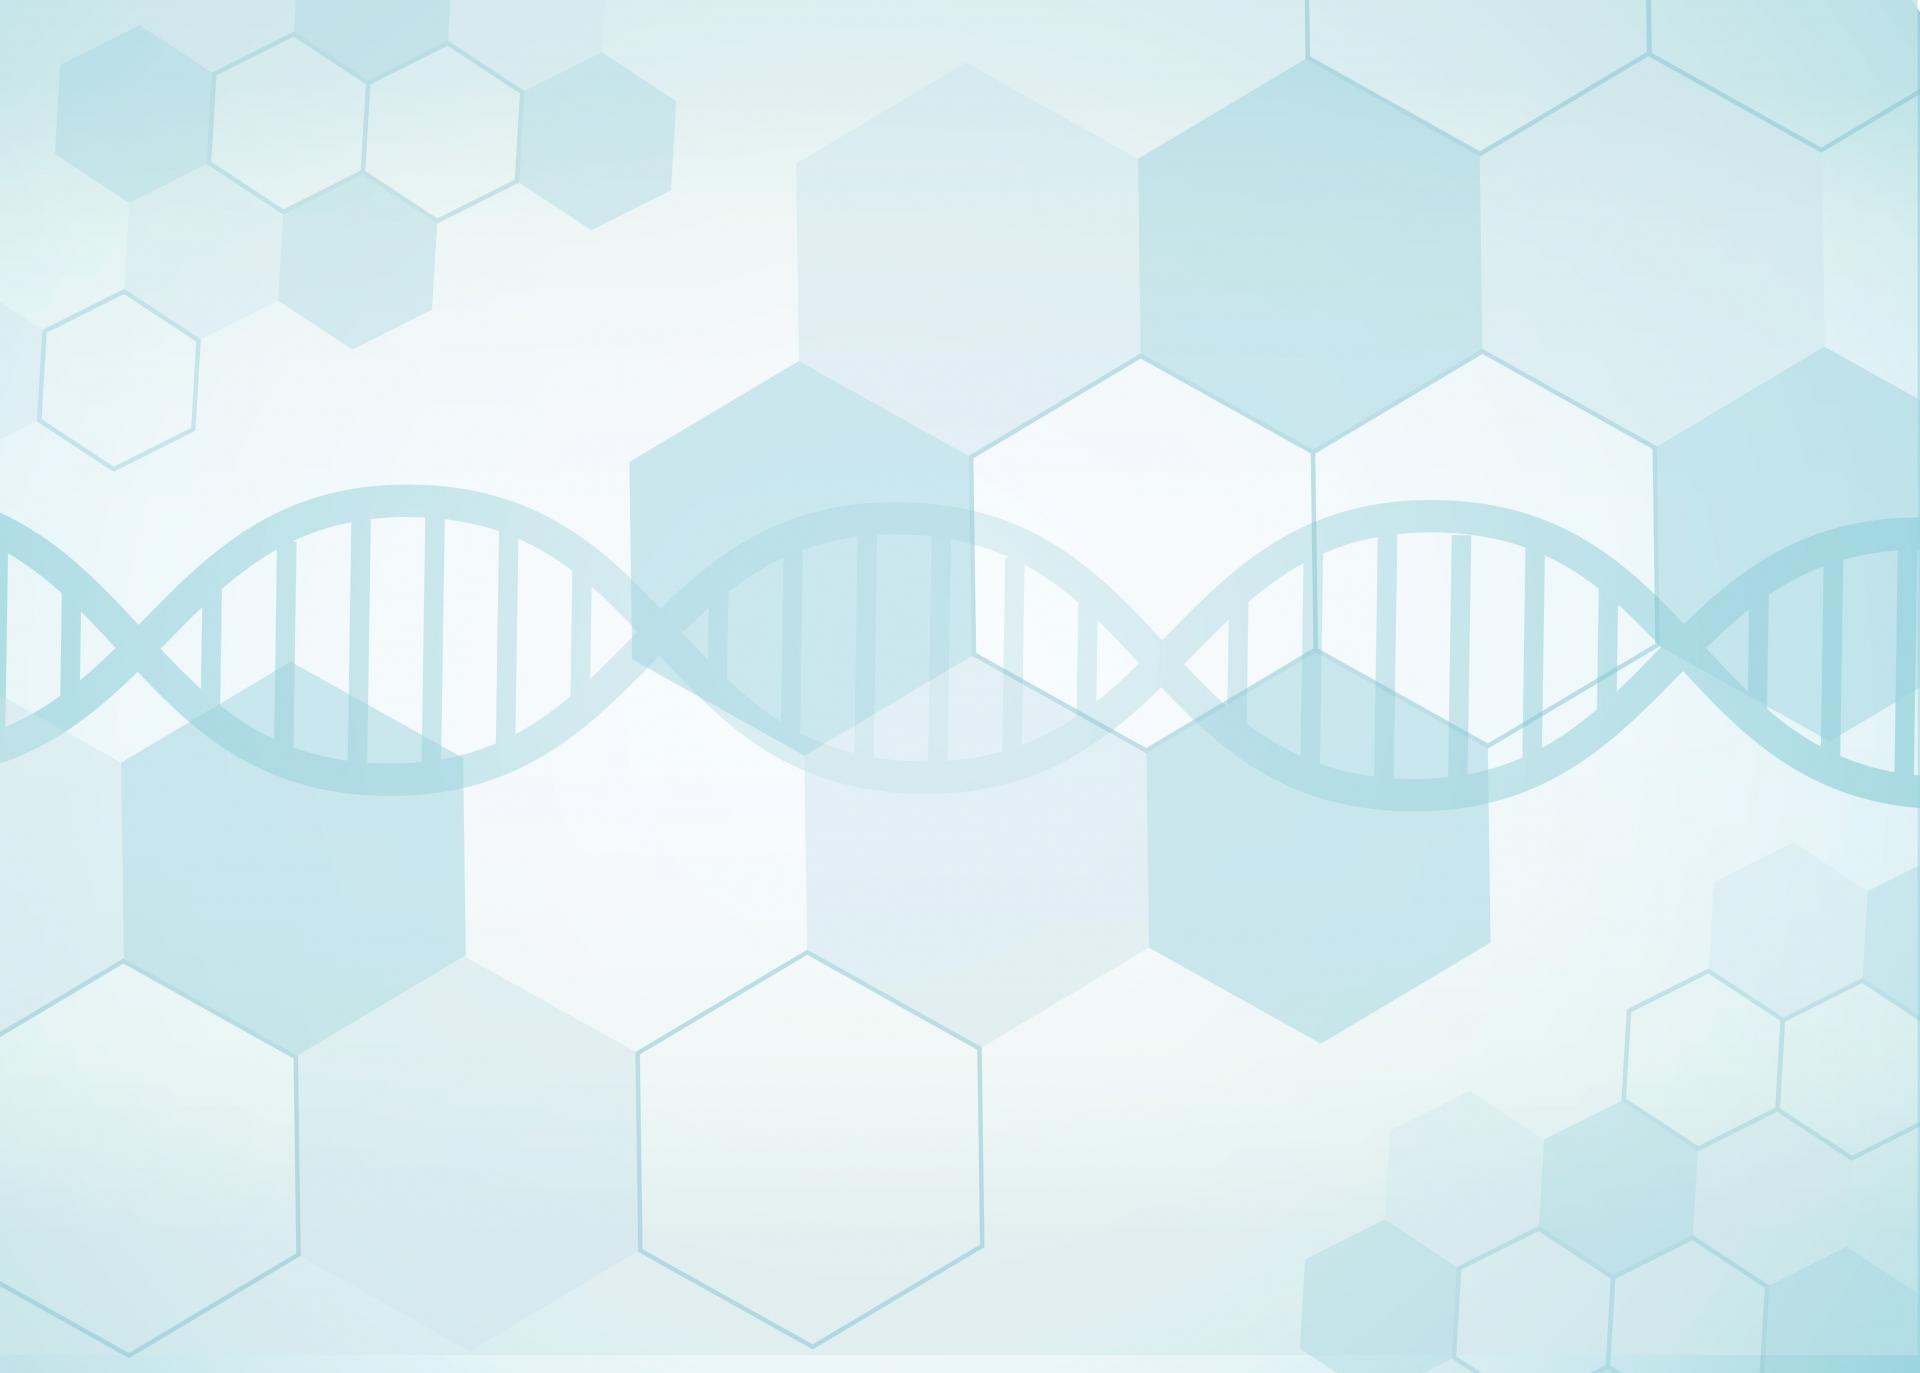 4b8a1e7fae7008aaf4017454abc31c24 m 生活習慣が遺伝子に影響を及ぼす「エピジェネティクス」